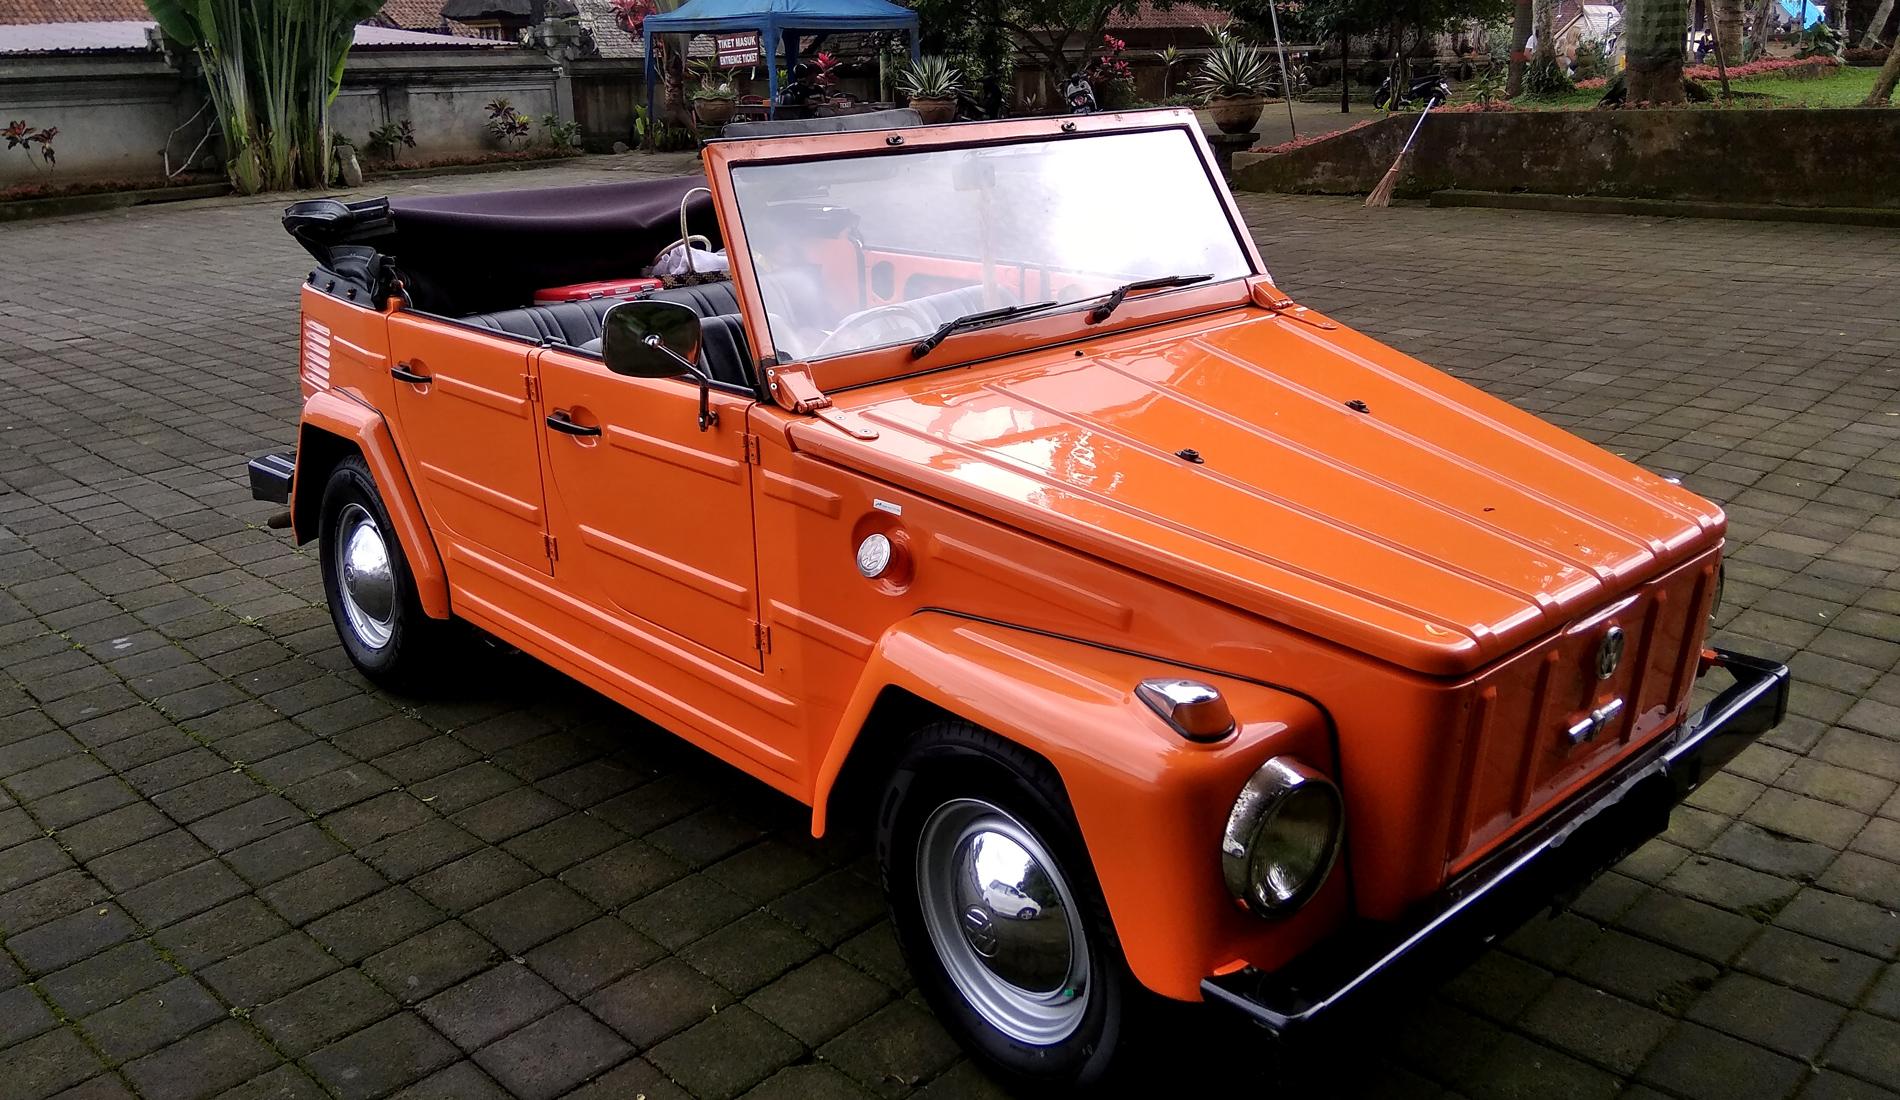 Bali Volkswagen Safari Tour Bali Unique Car Charter Package